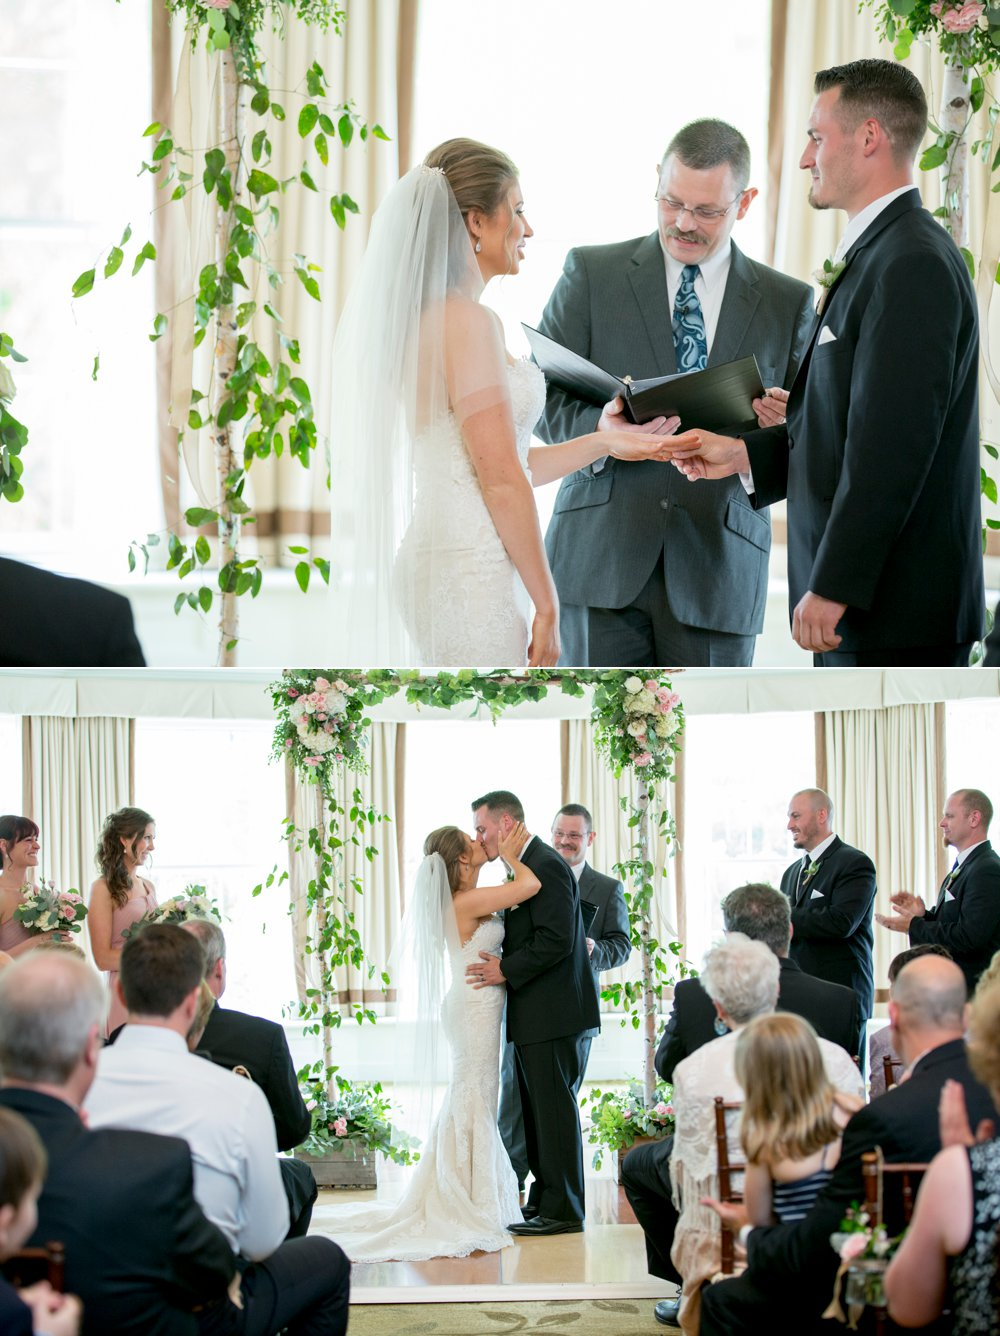 SomerbyJonesPhotography_EquinoxVermont_Wedding_0023.jpg